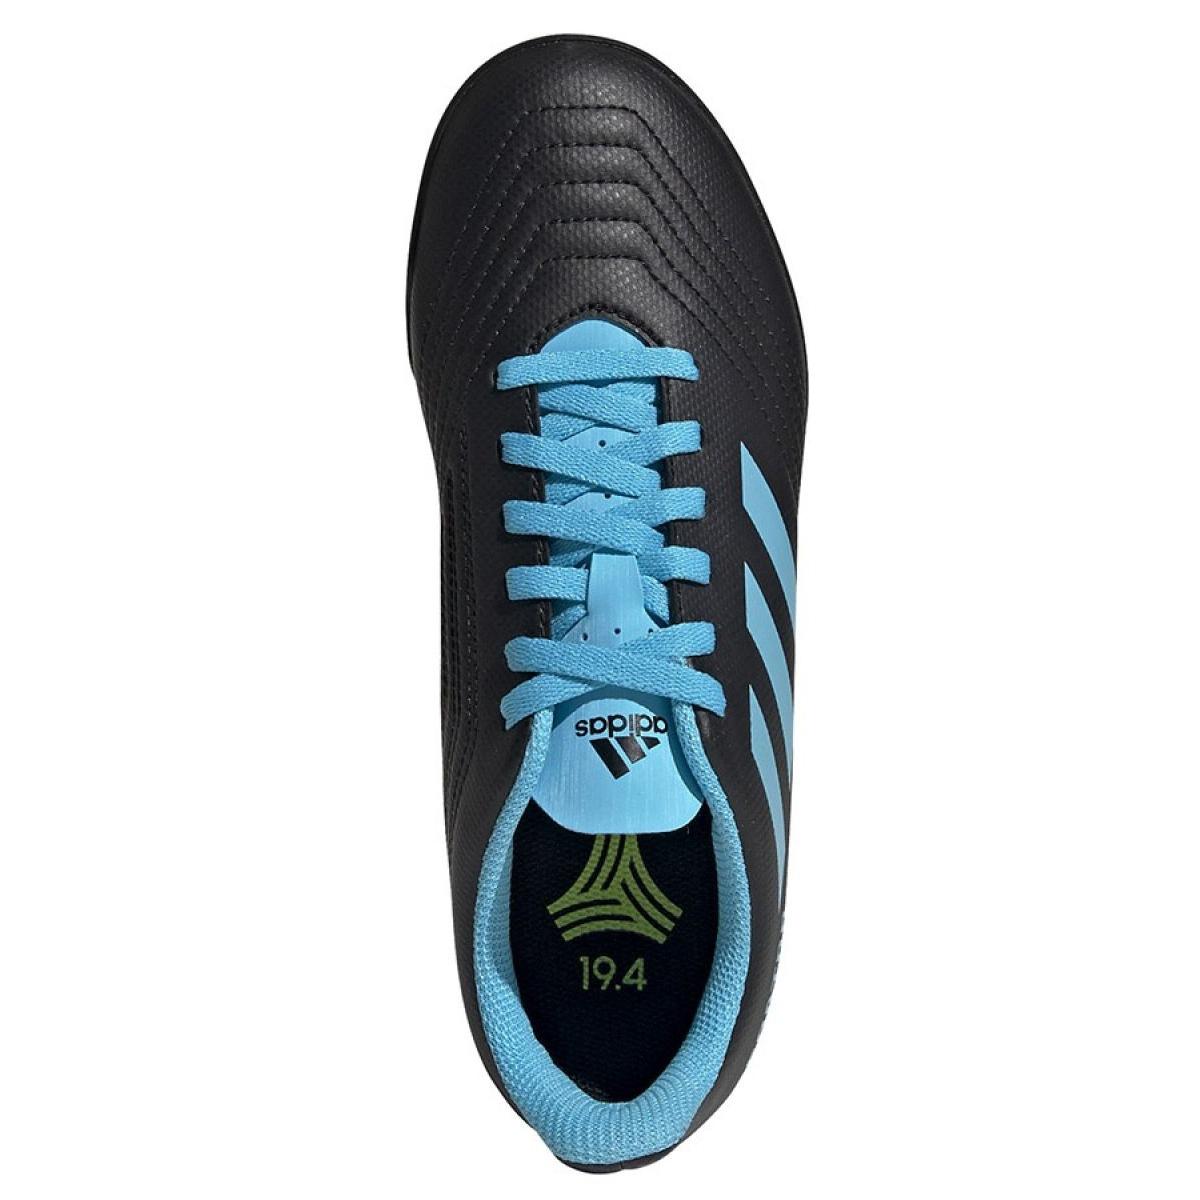 Adidas Predator 19.4 Tf Jr G25826 futballcipő fekete fekete